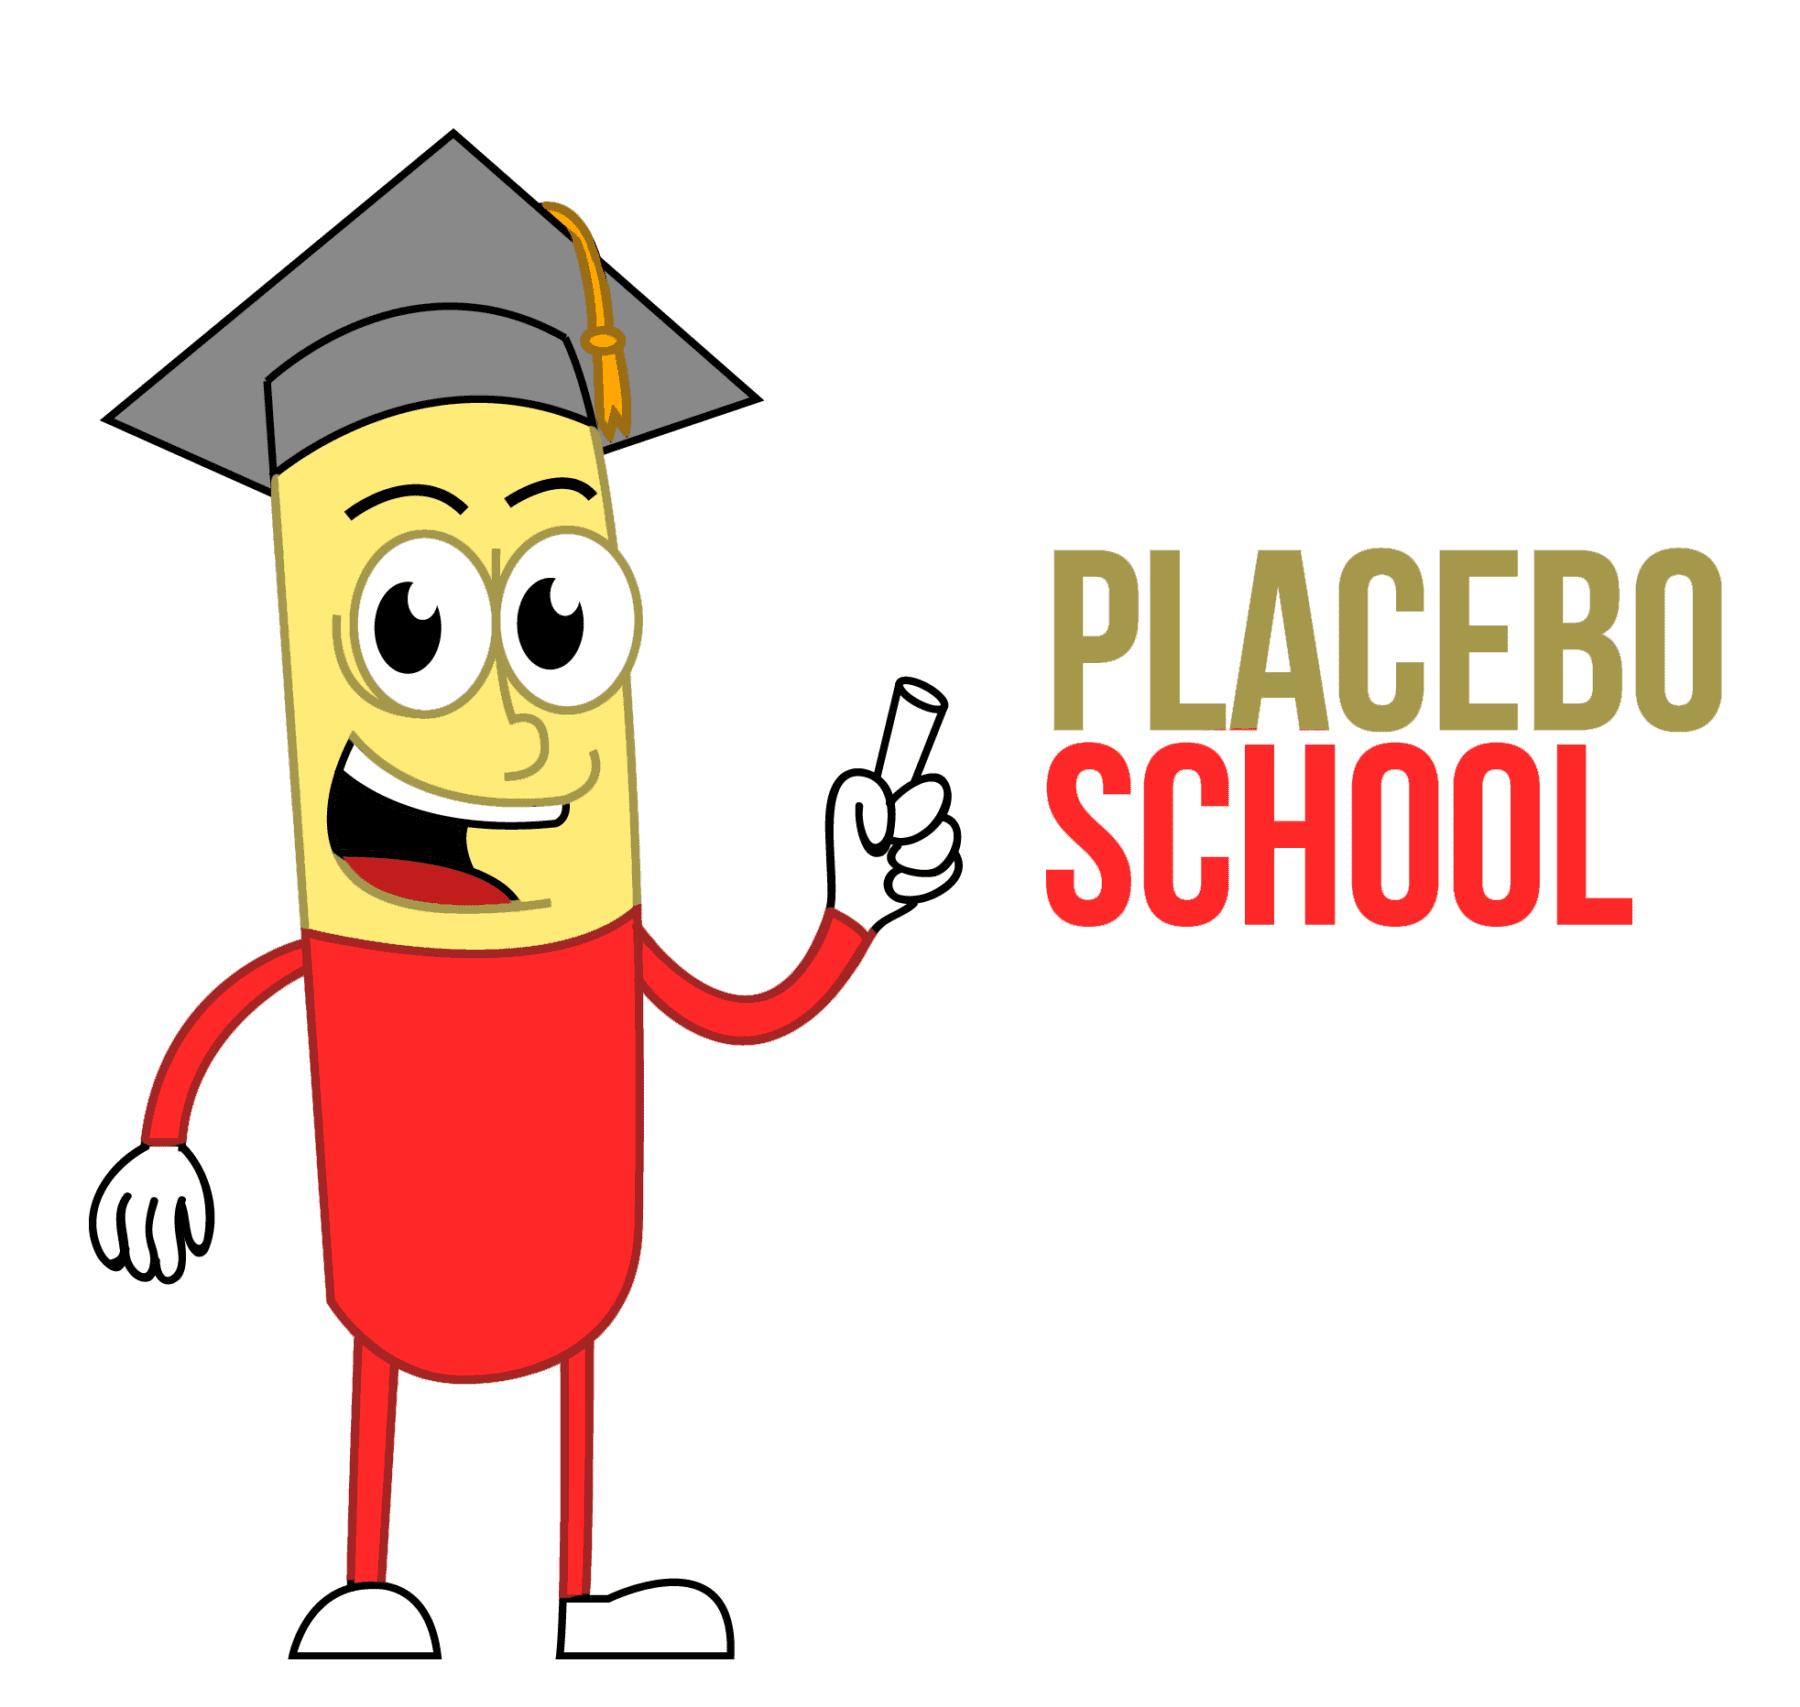 Placebo_School logo